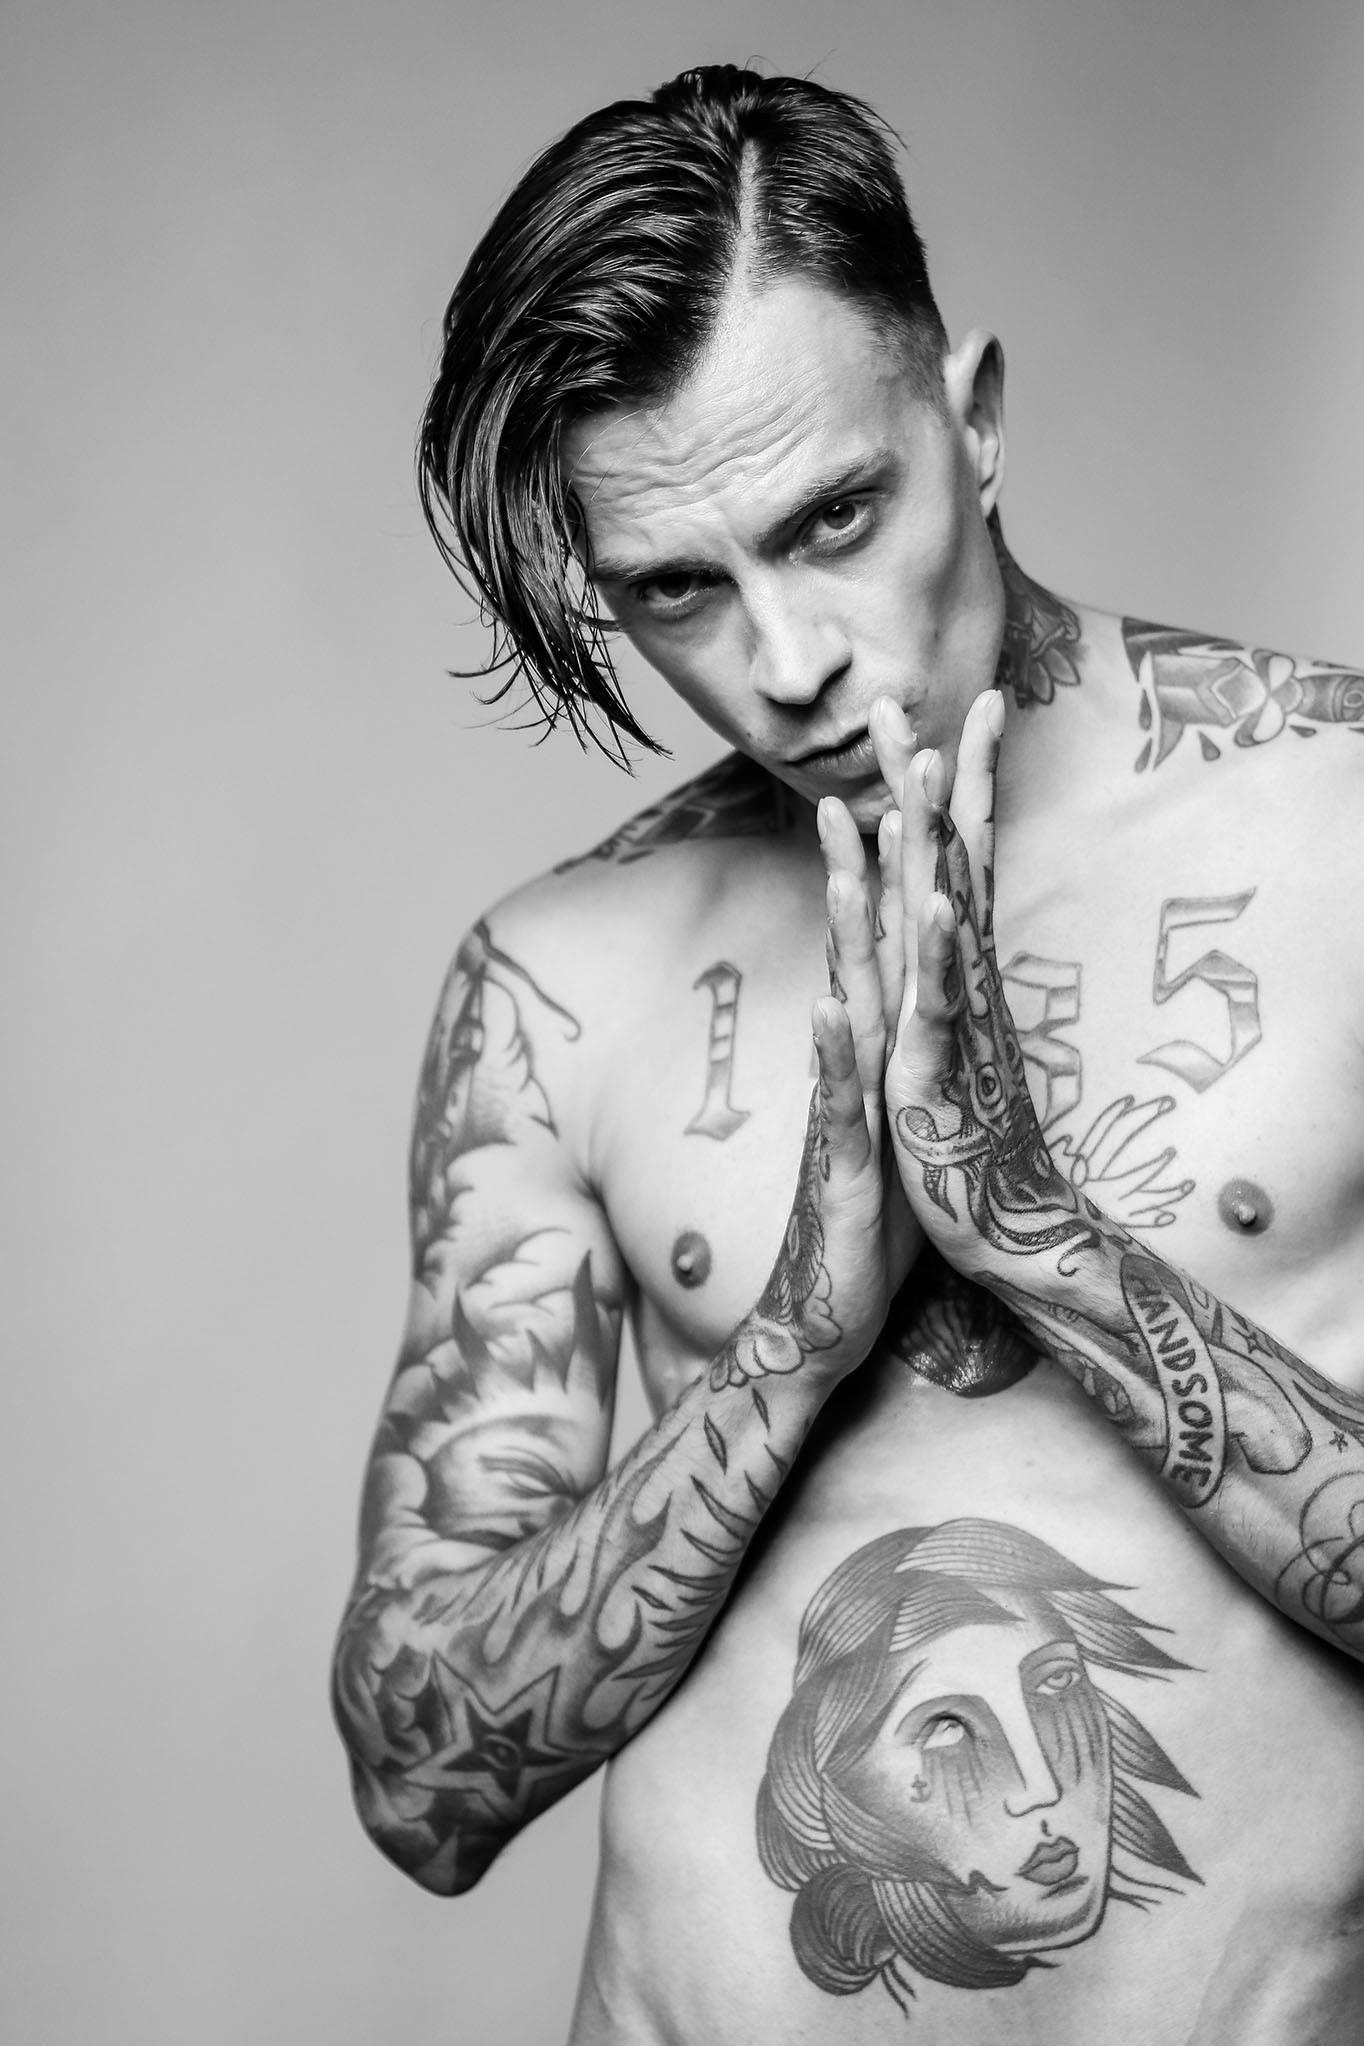 male model schwarzweiß Portrait Tattoos style